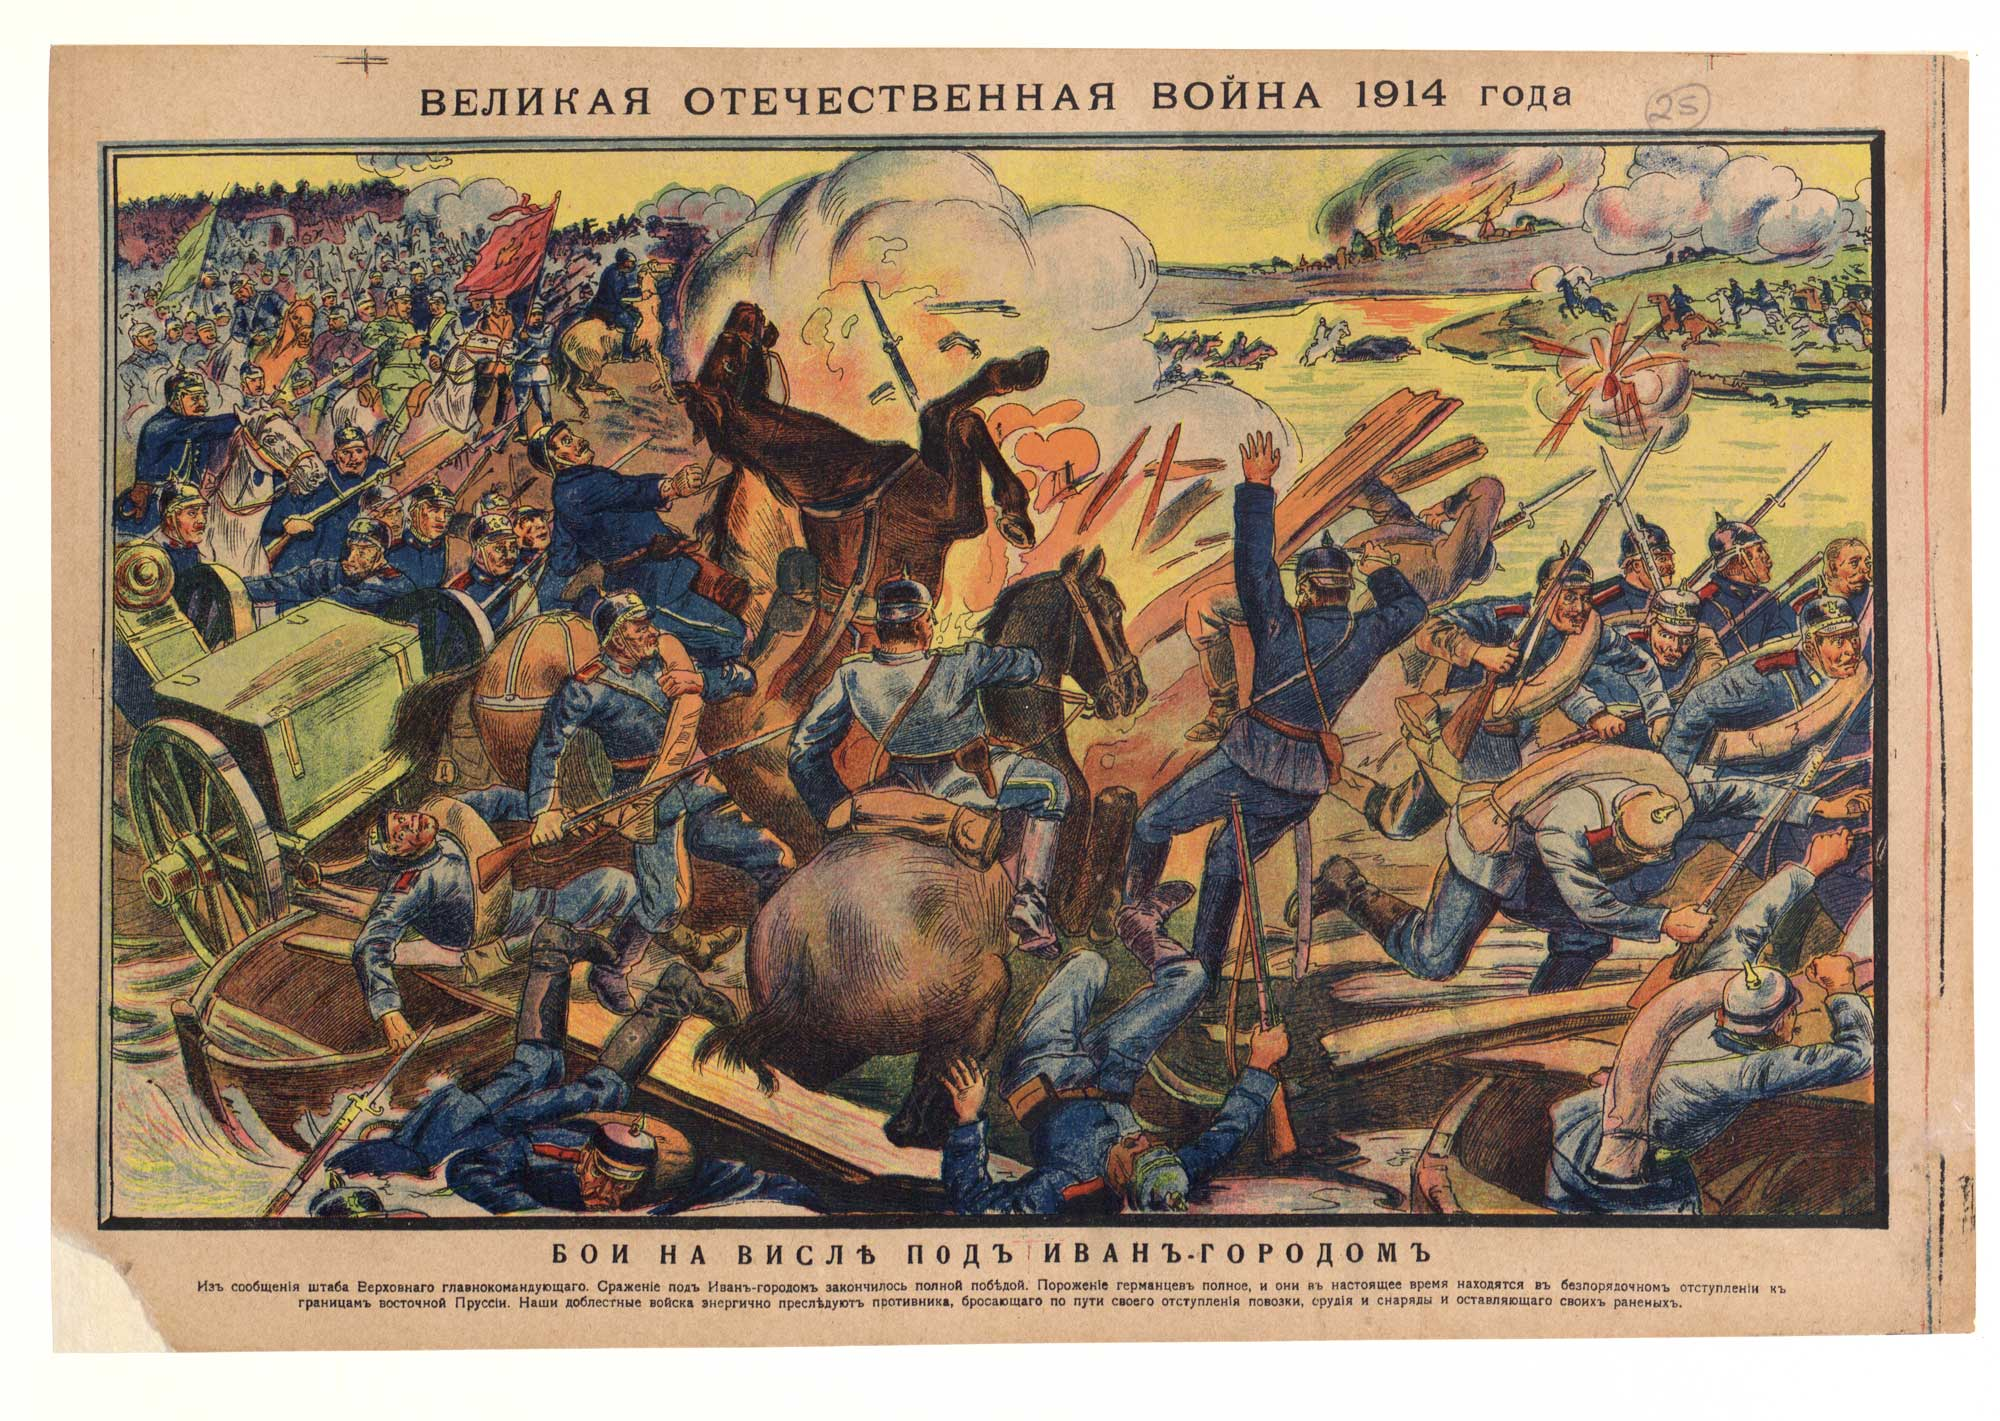 The Great Patriotic War of 1914